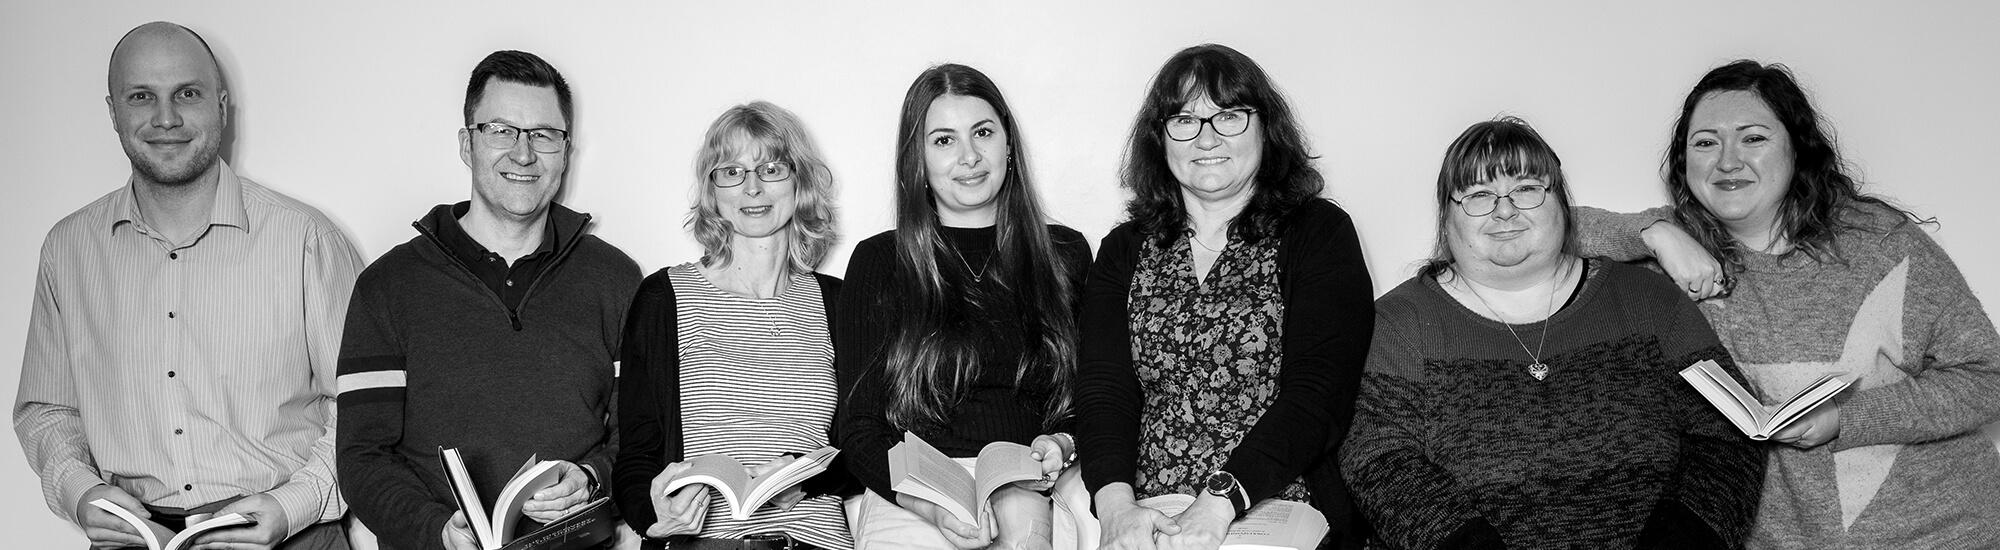 tj books team - About Us